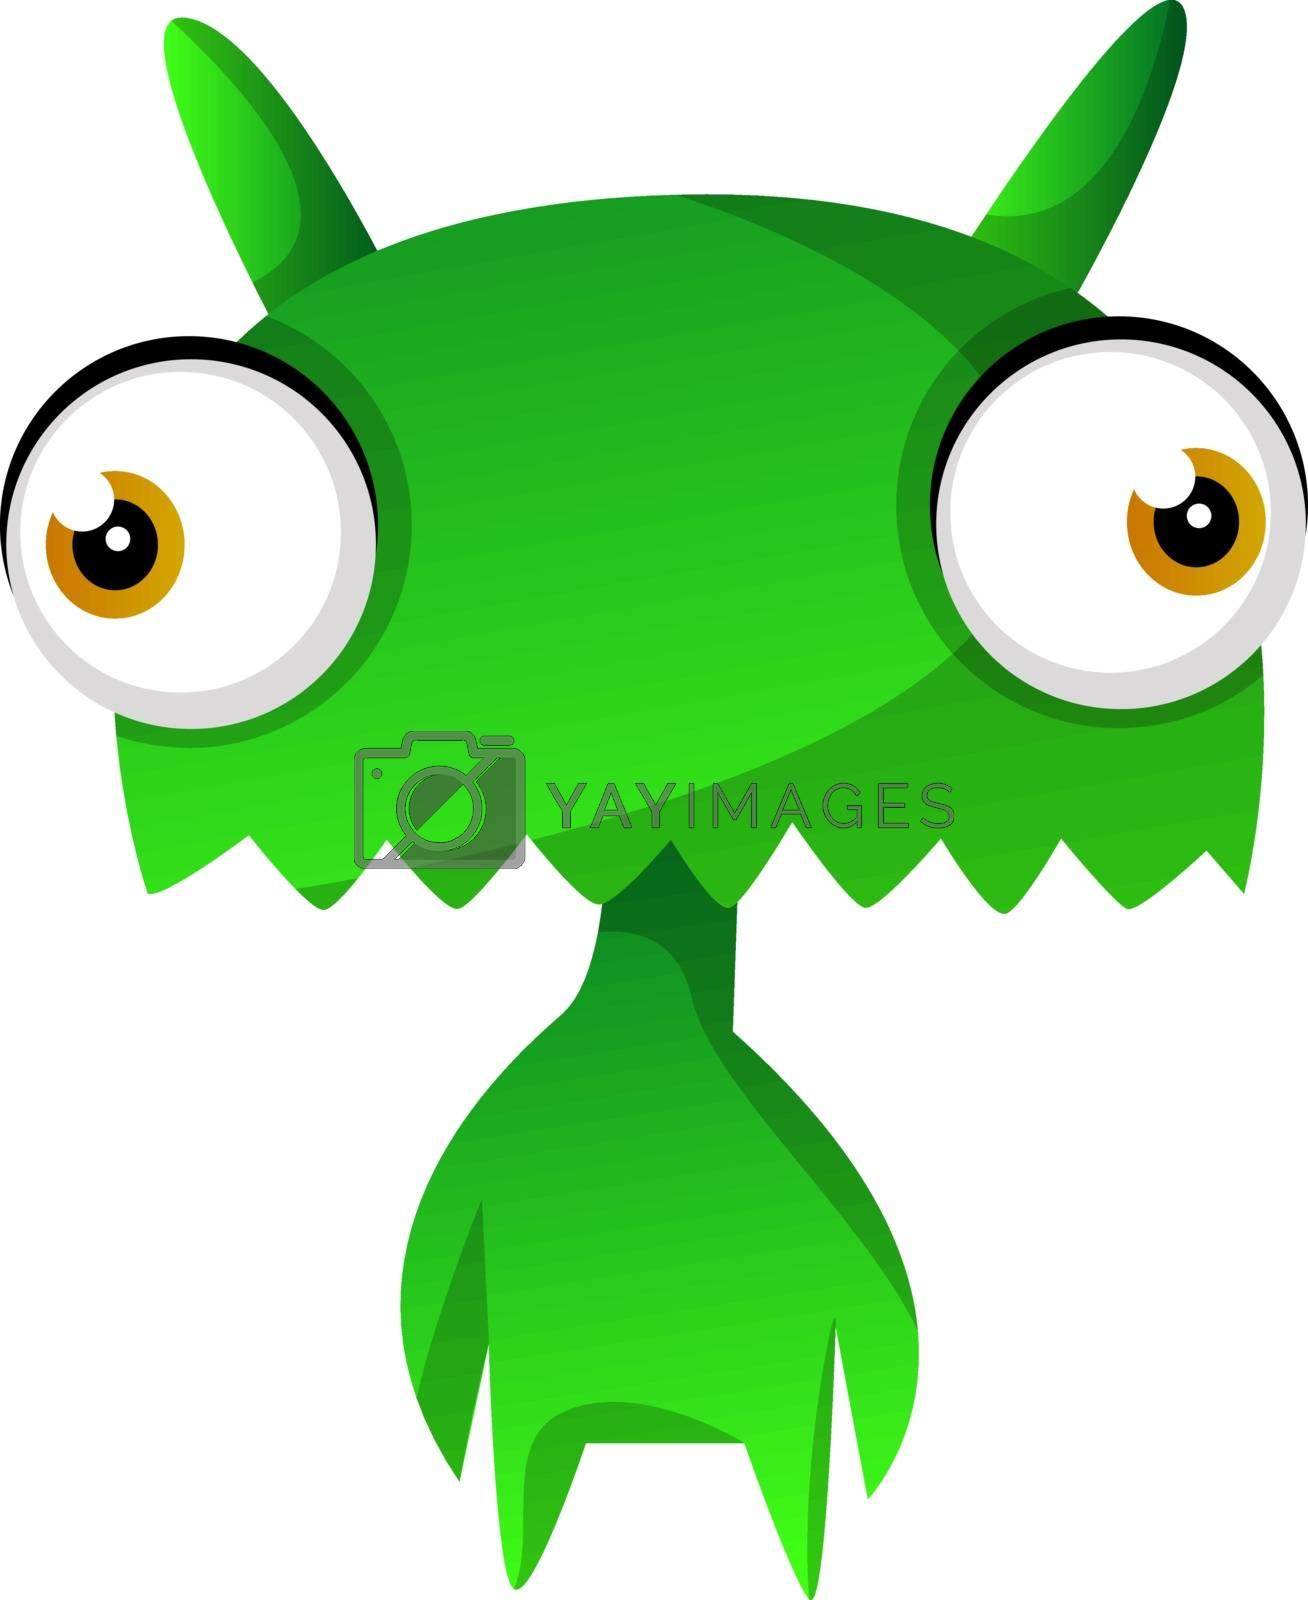 Royalty free image of Green cute monster illustration vector on white backgroundPrint by Morphart